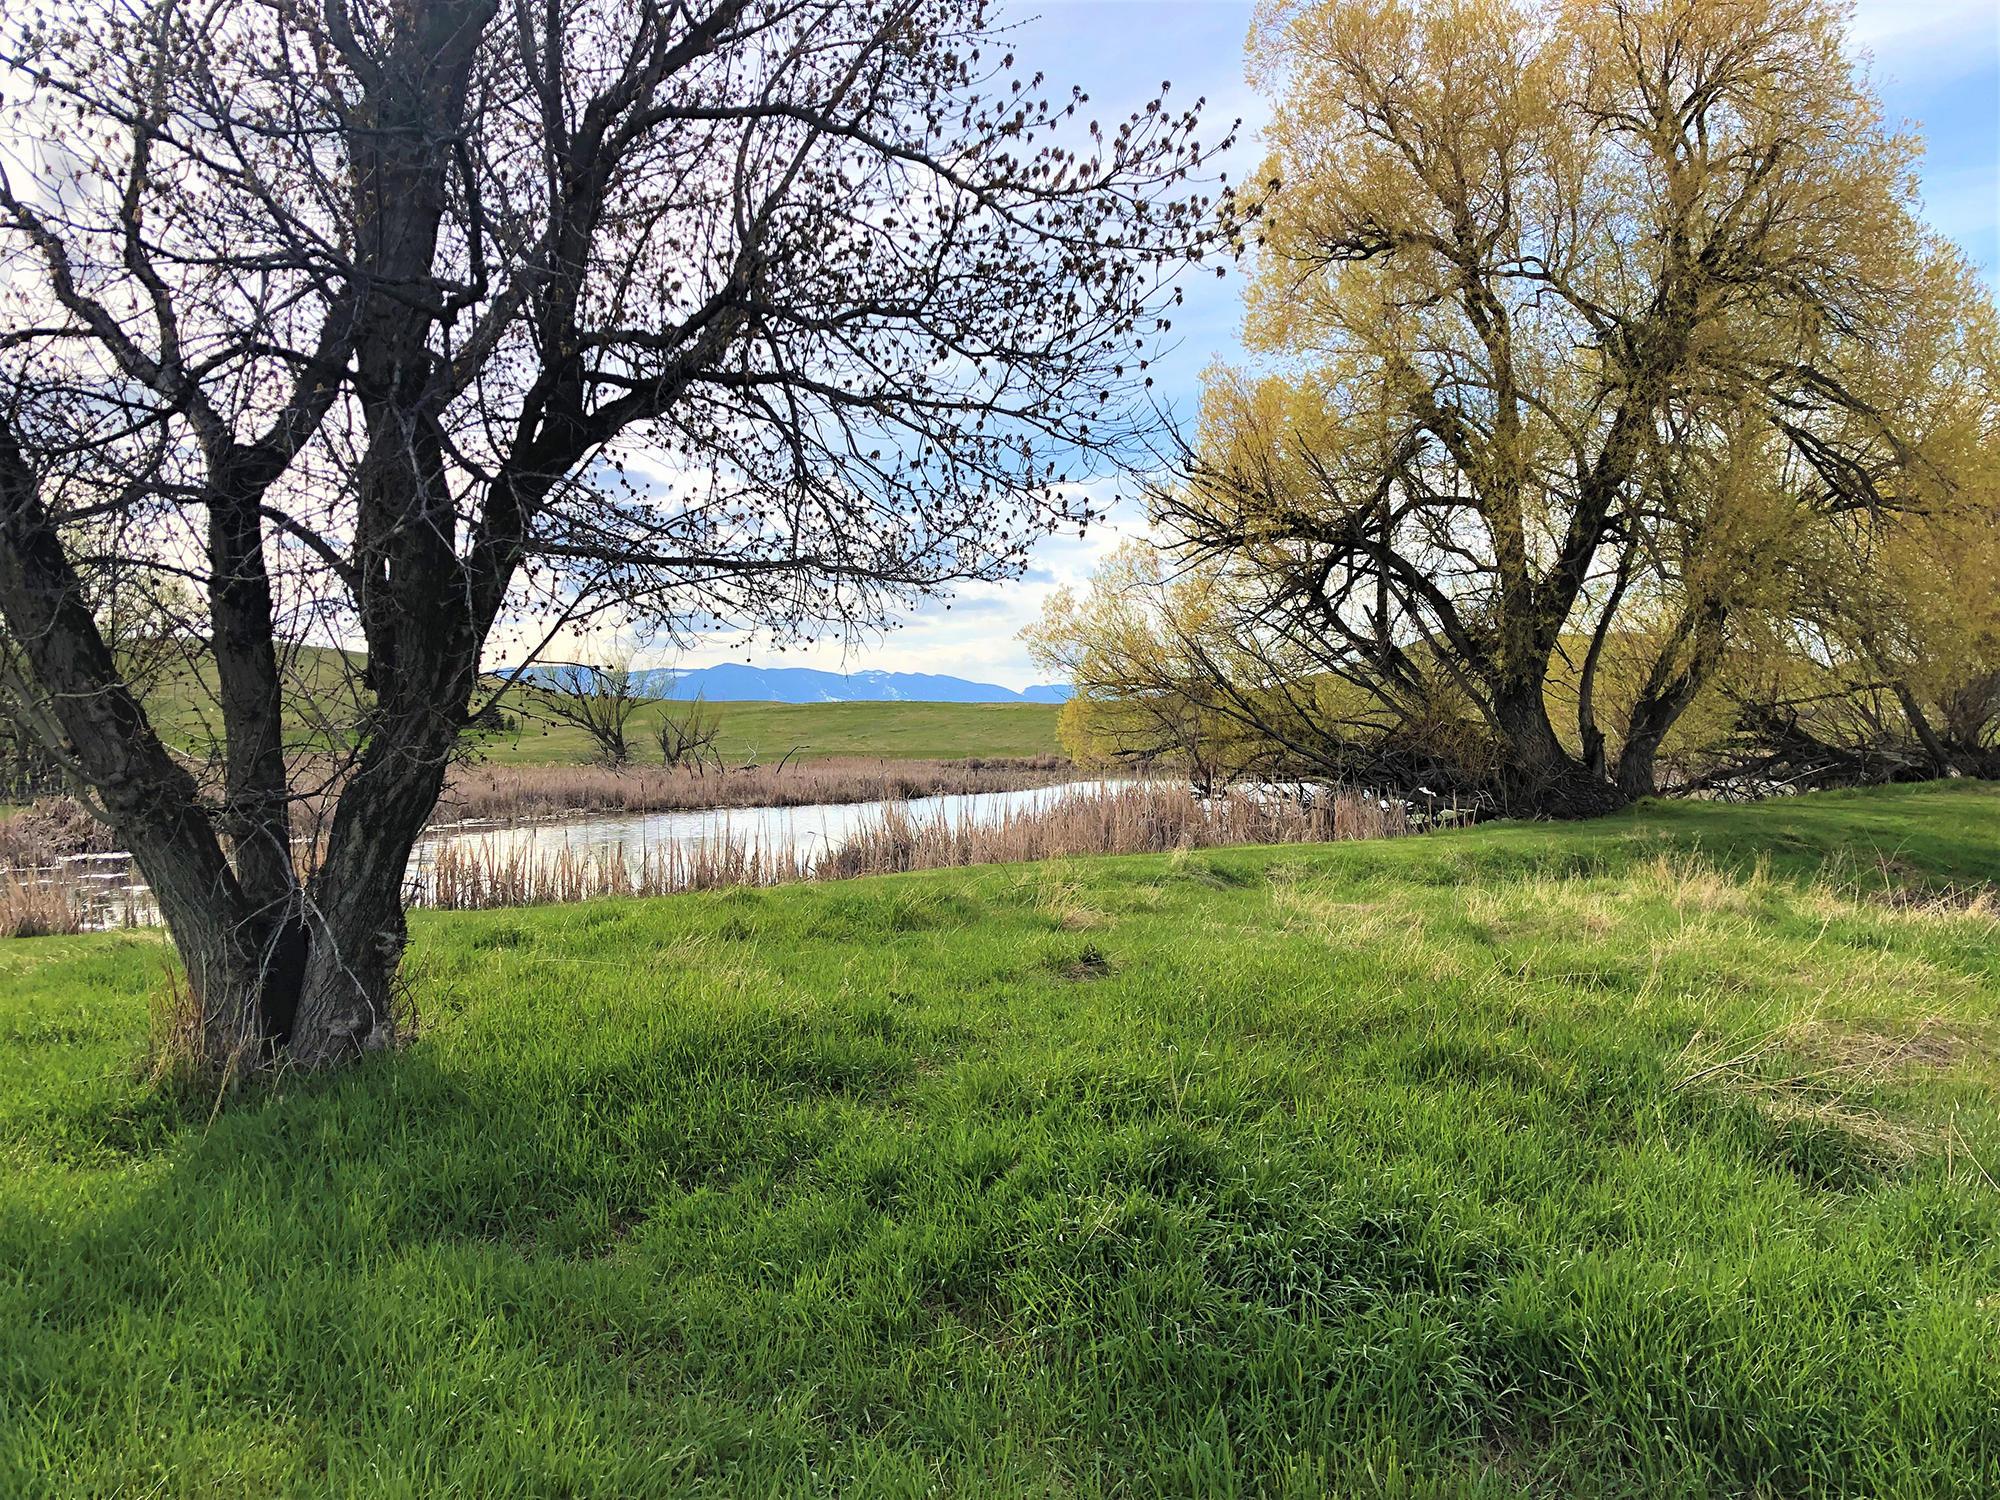 185/183 Bird Farm Road, Sheridan, Wyoming 82801, 3 Bedrooms Bedrooms, ,2 BathroomsBathrooms,Ranch,For Sale,Bird Farm,19-405